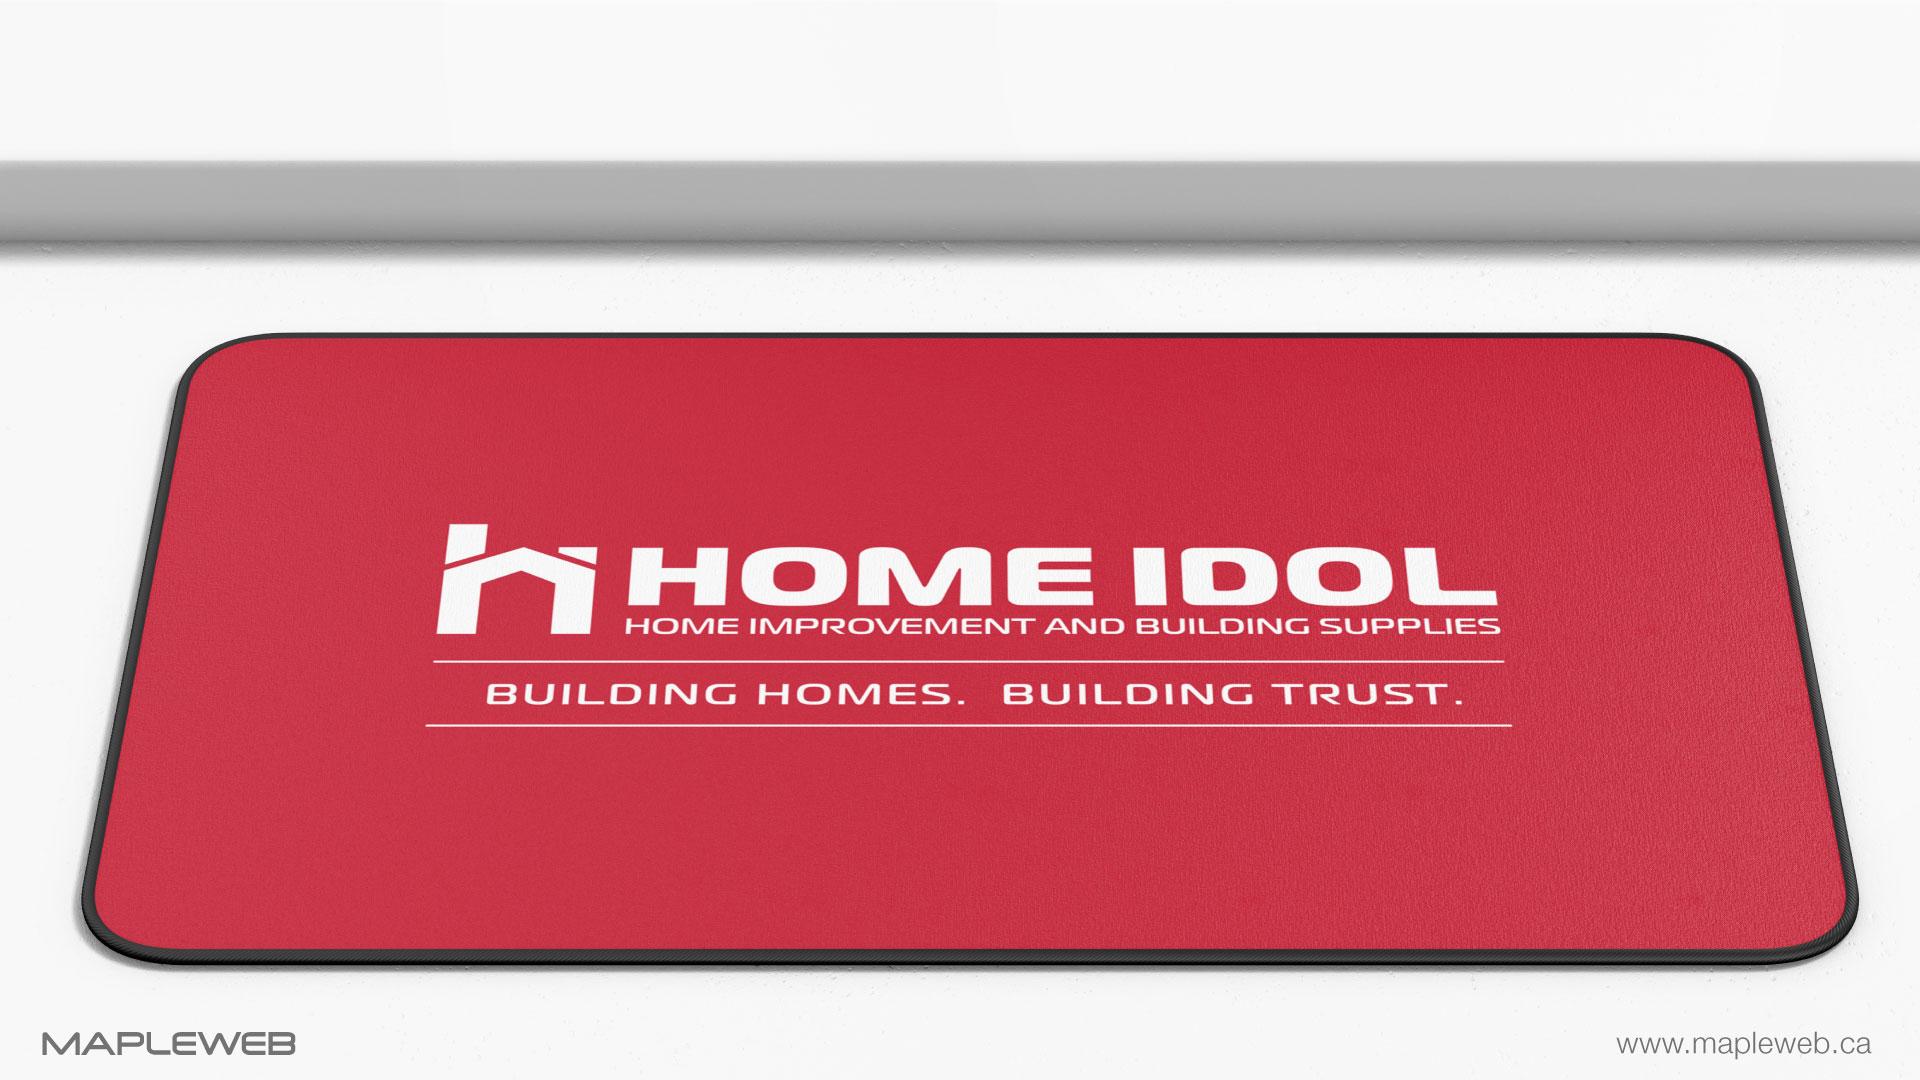 home-idol-brand-logo-design-by-mapleweb-vancouver-canada-floor-mat-mock